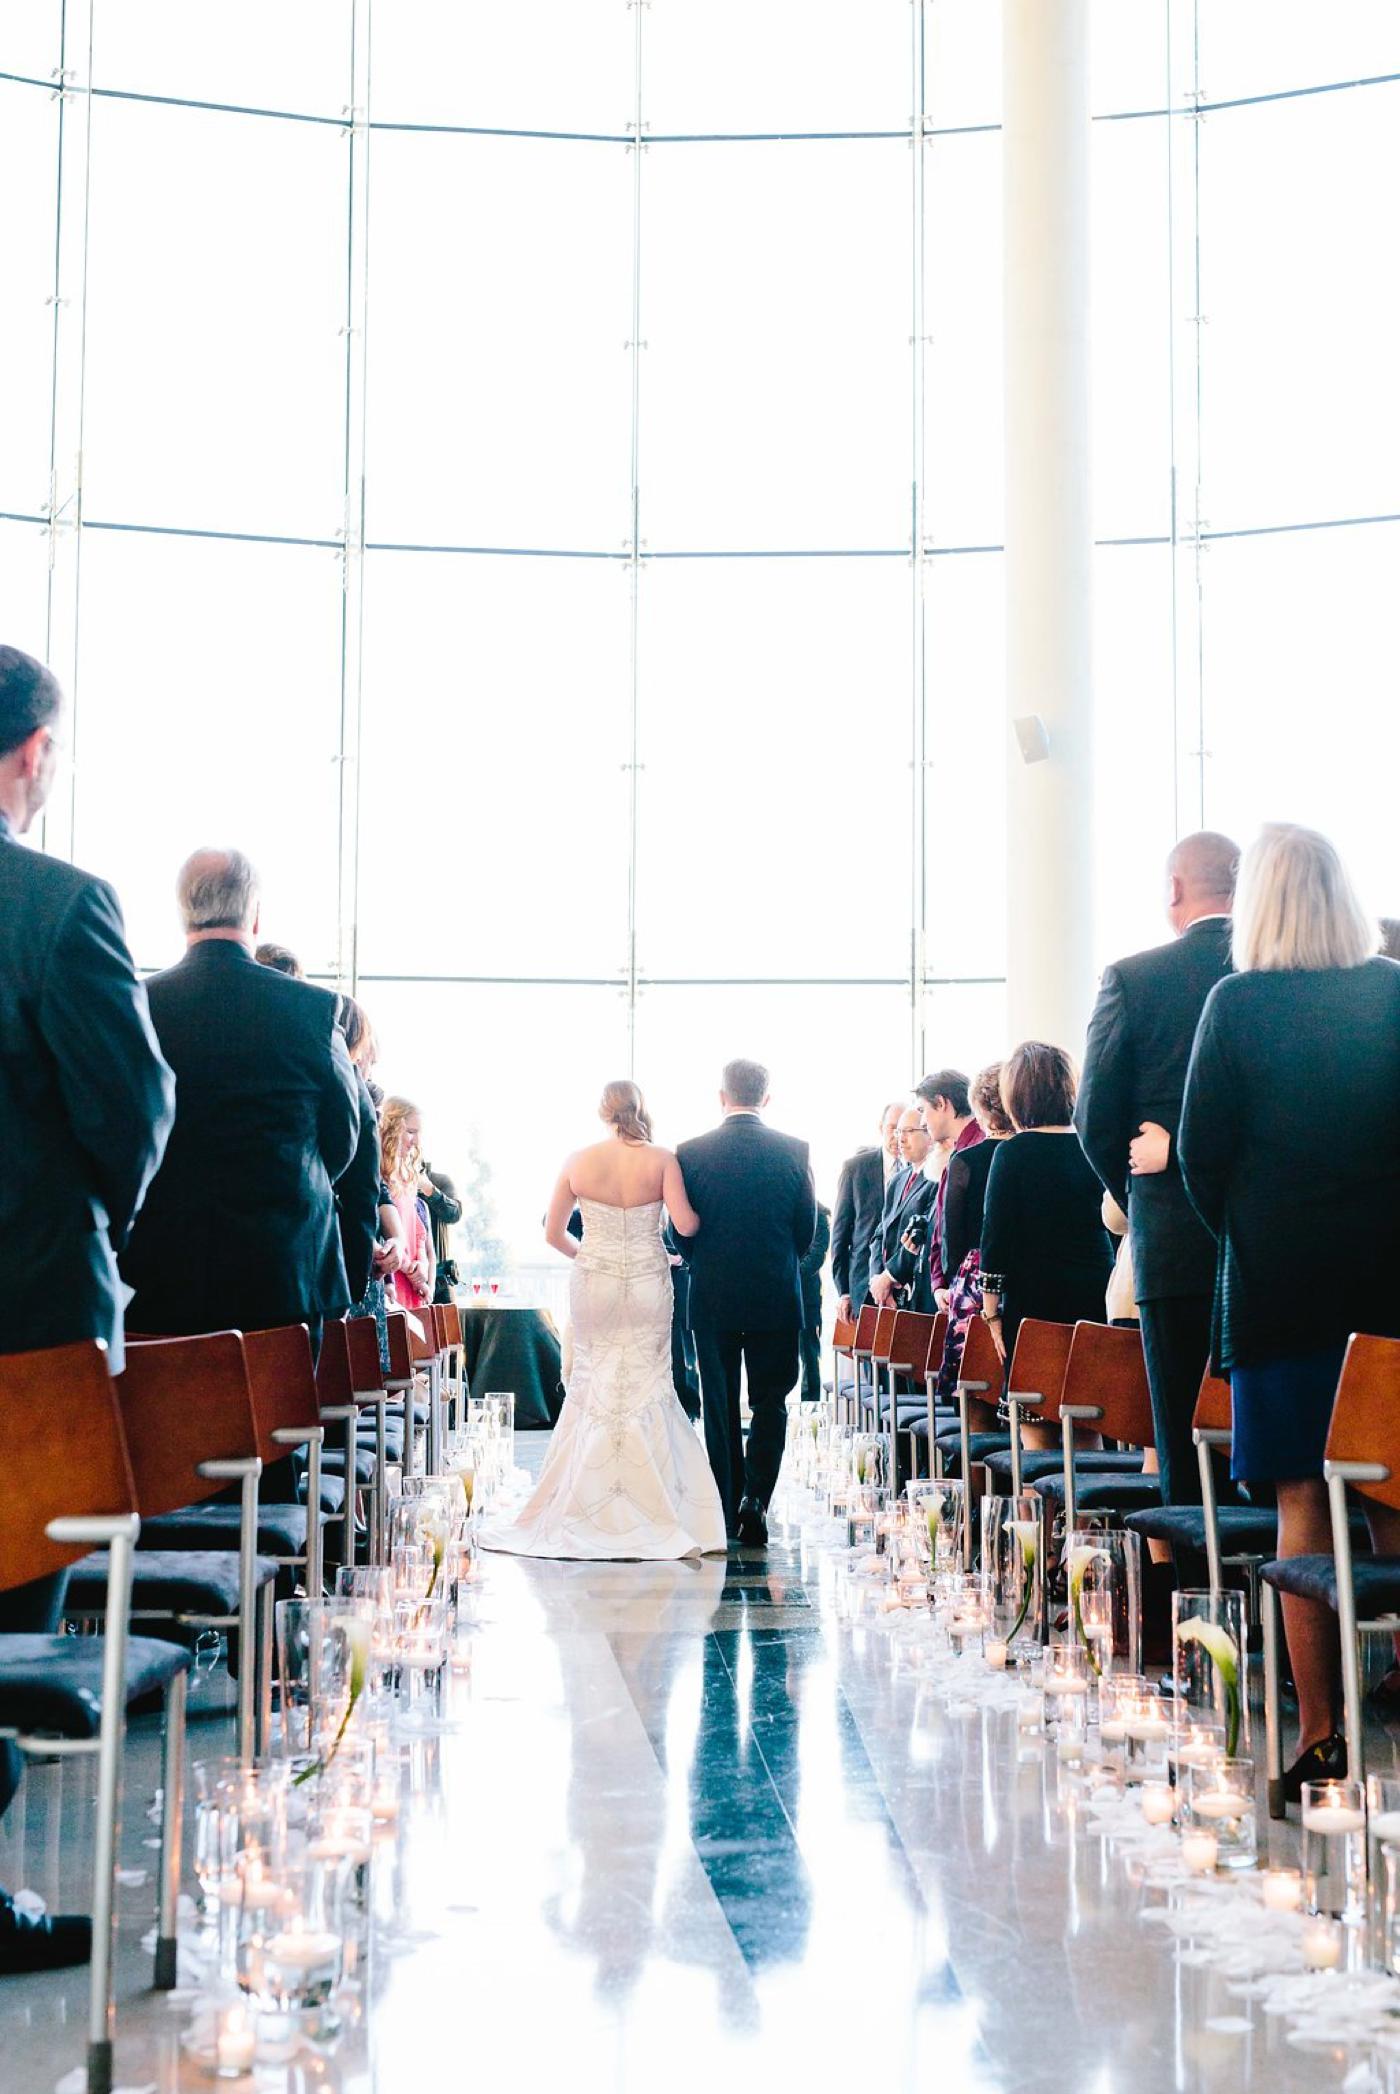 chicago-fine-art-wedding-photography-burnette15